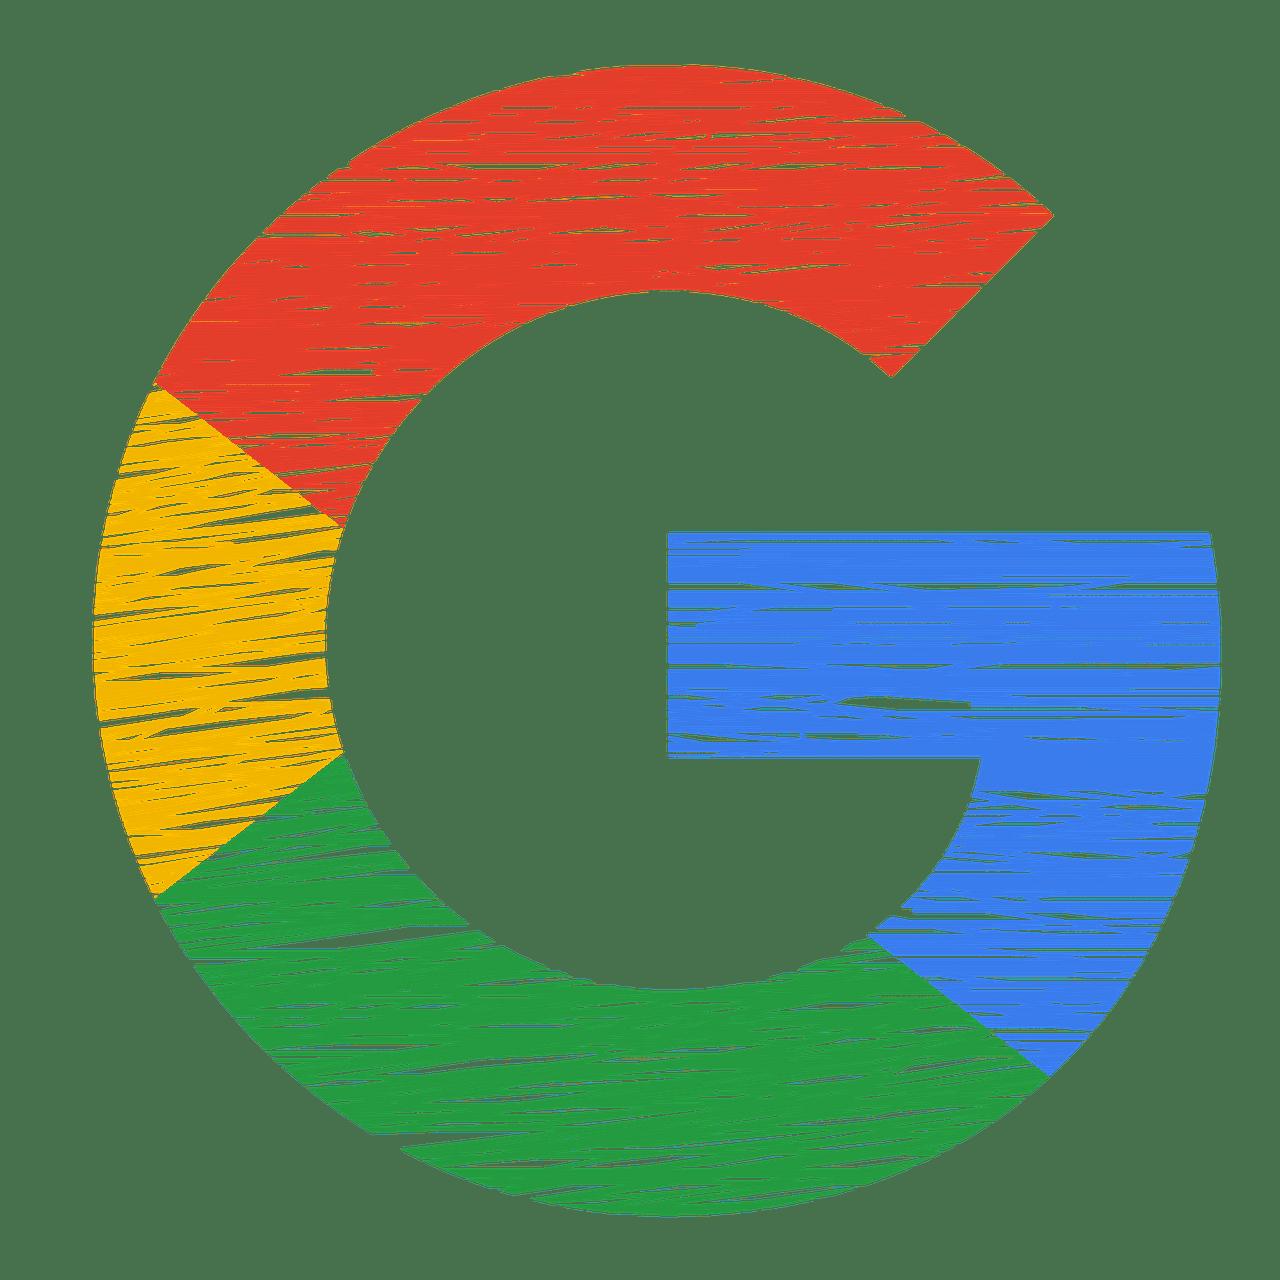 Google 20 years old